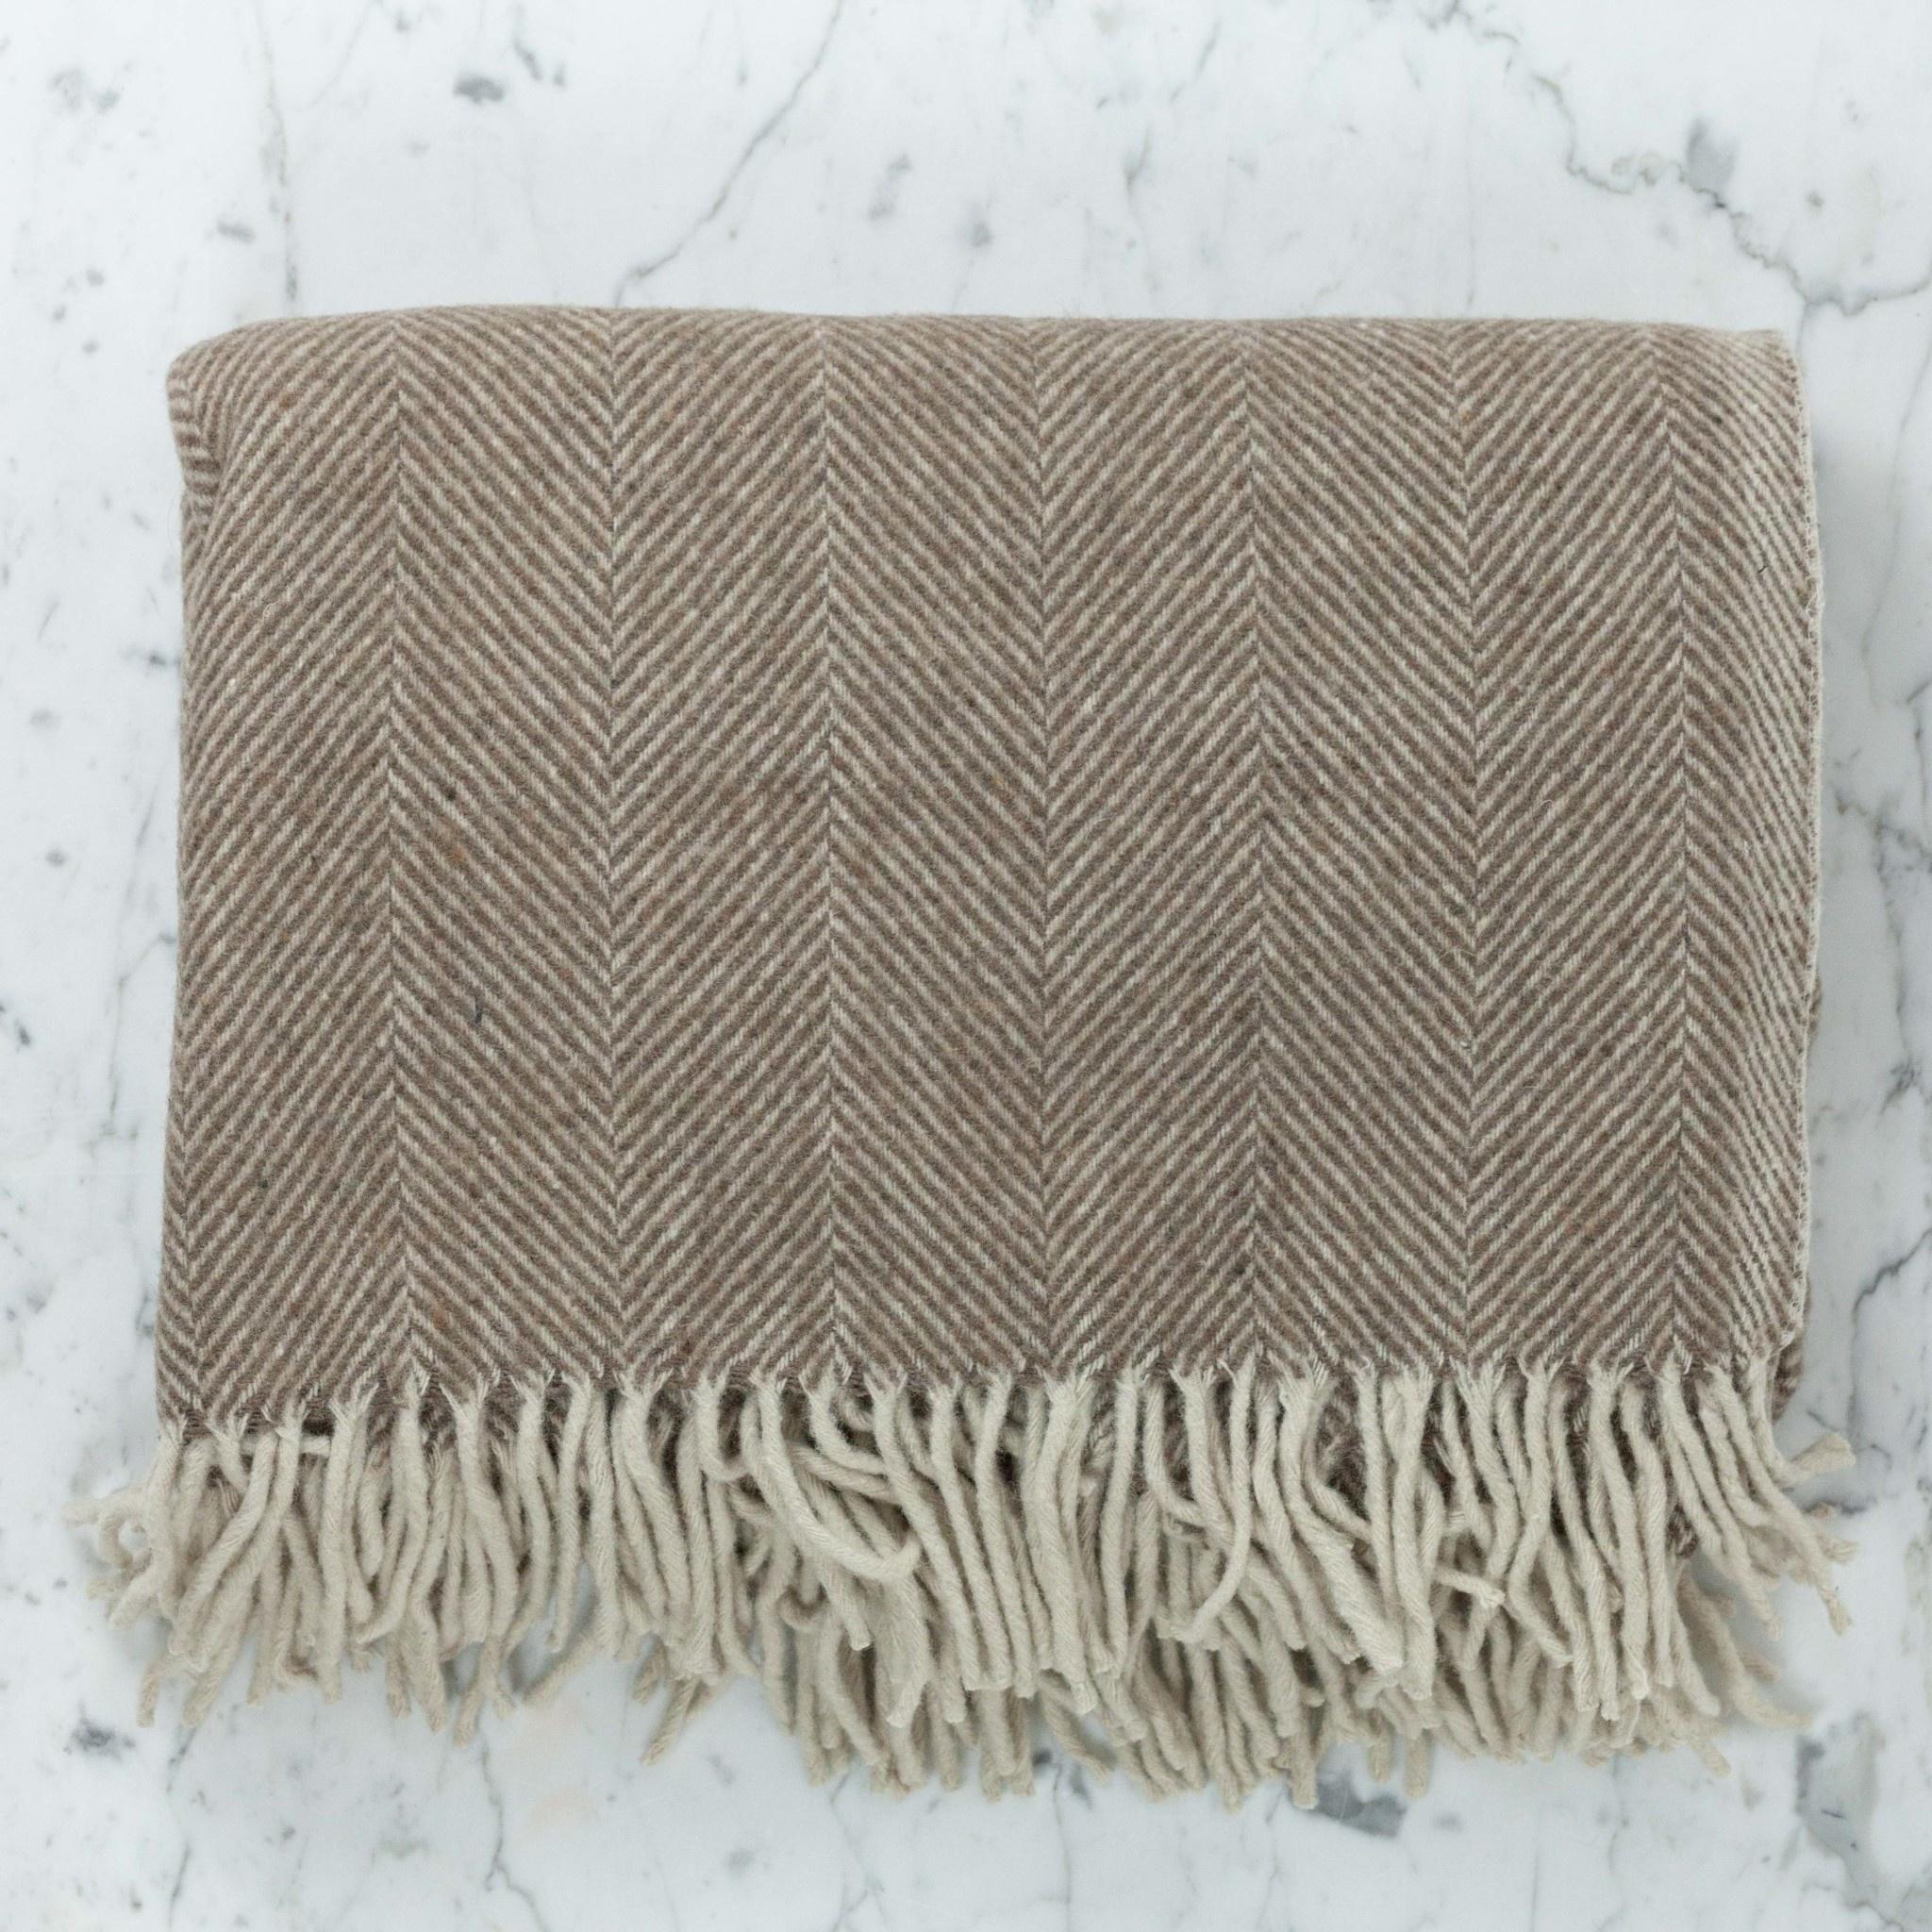 The Tartan Blanket Co Recycled Wool Blanket - Natural Herringbone